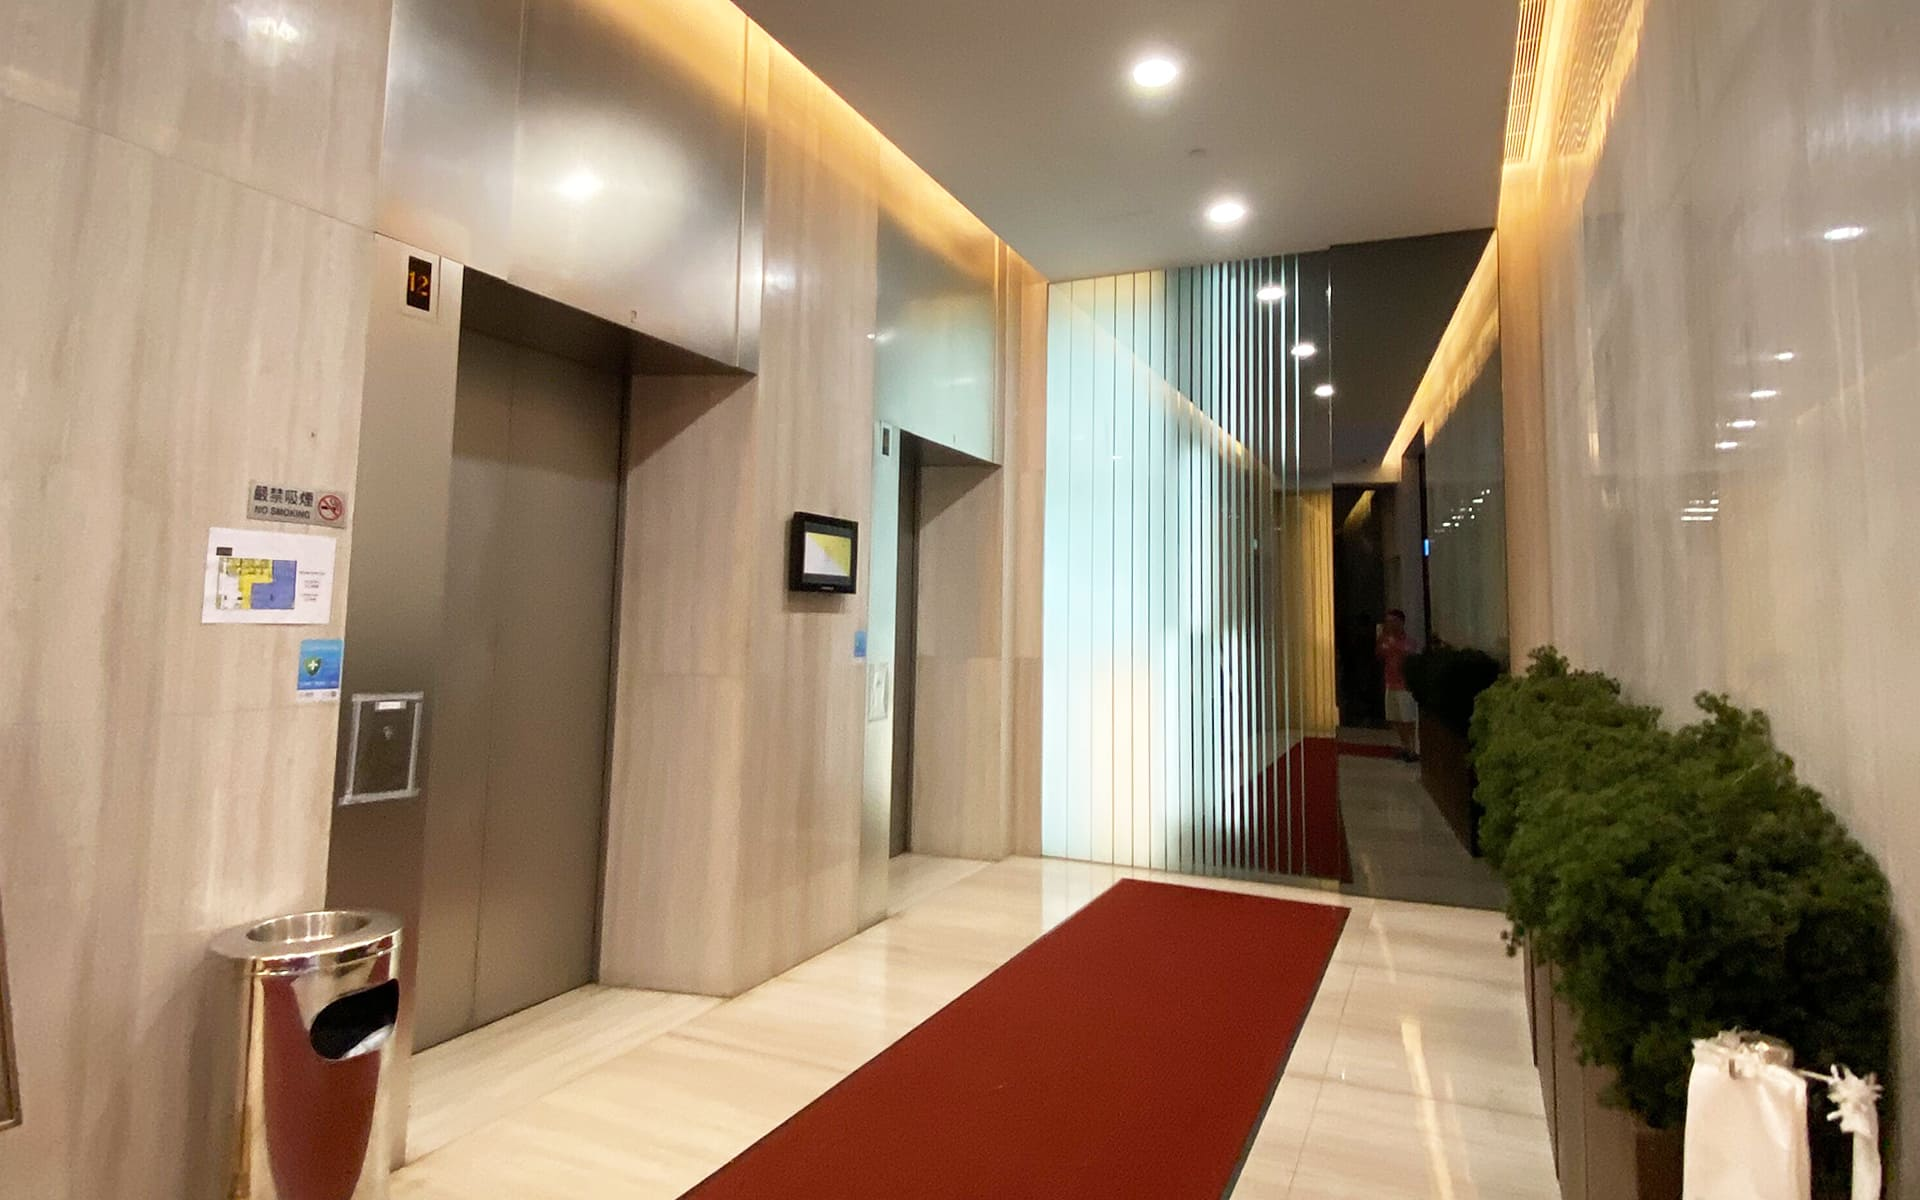 hk_service_apartment_5324480981589447075.jpg